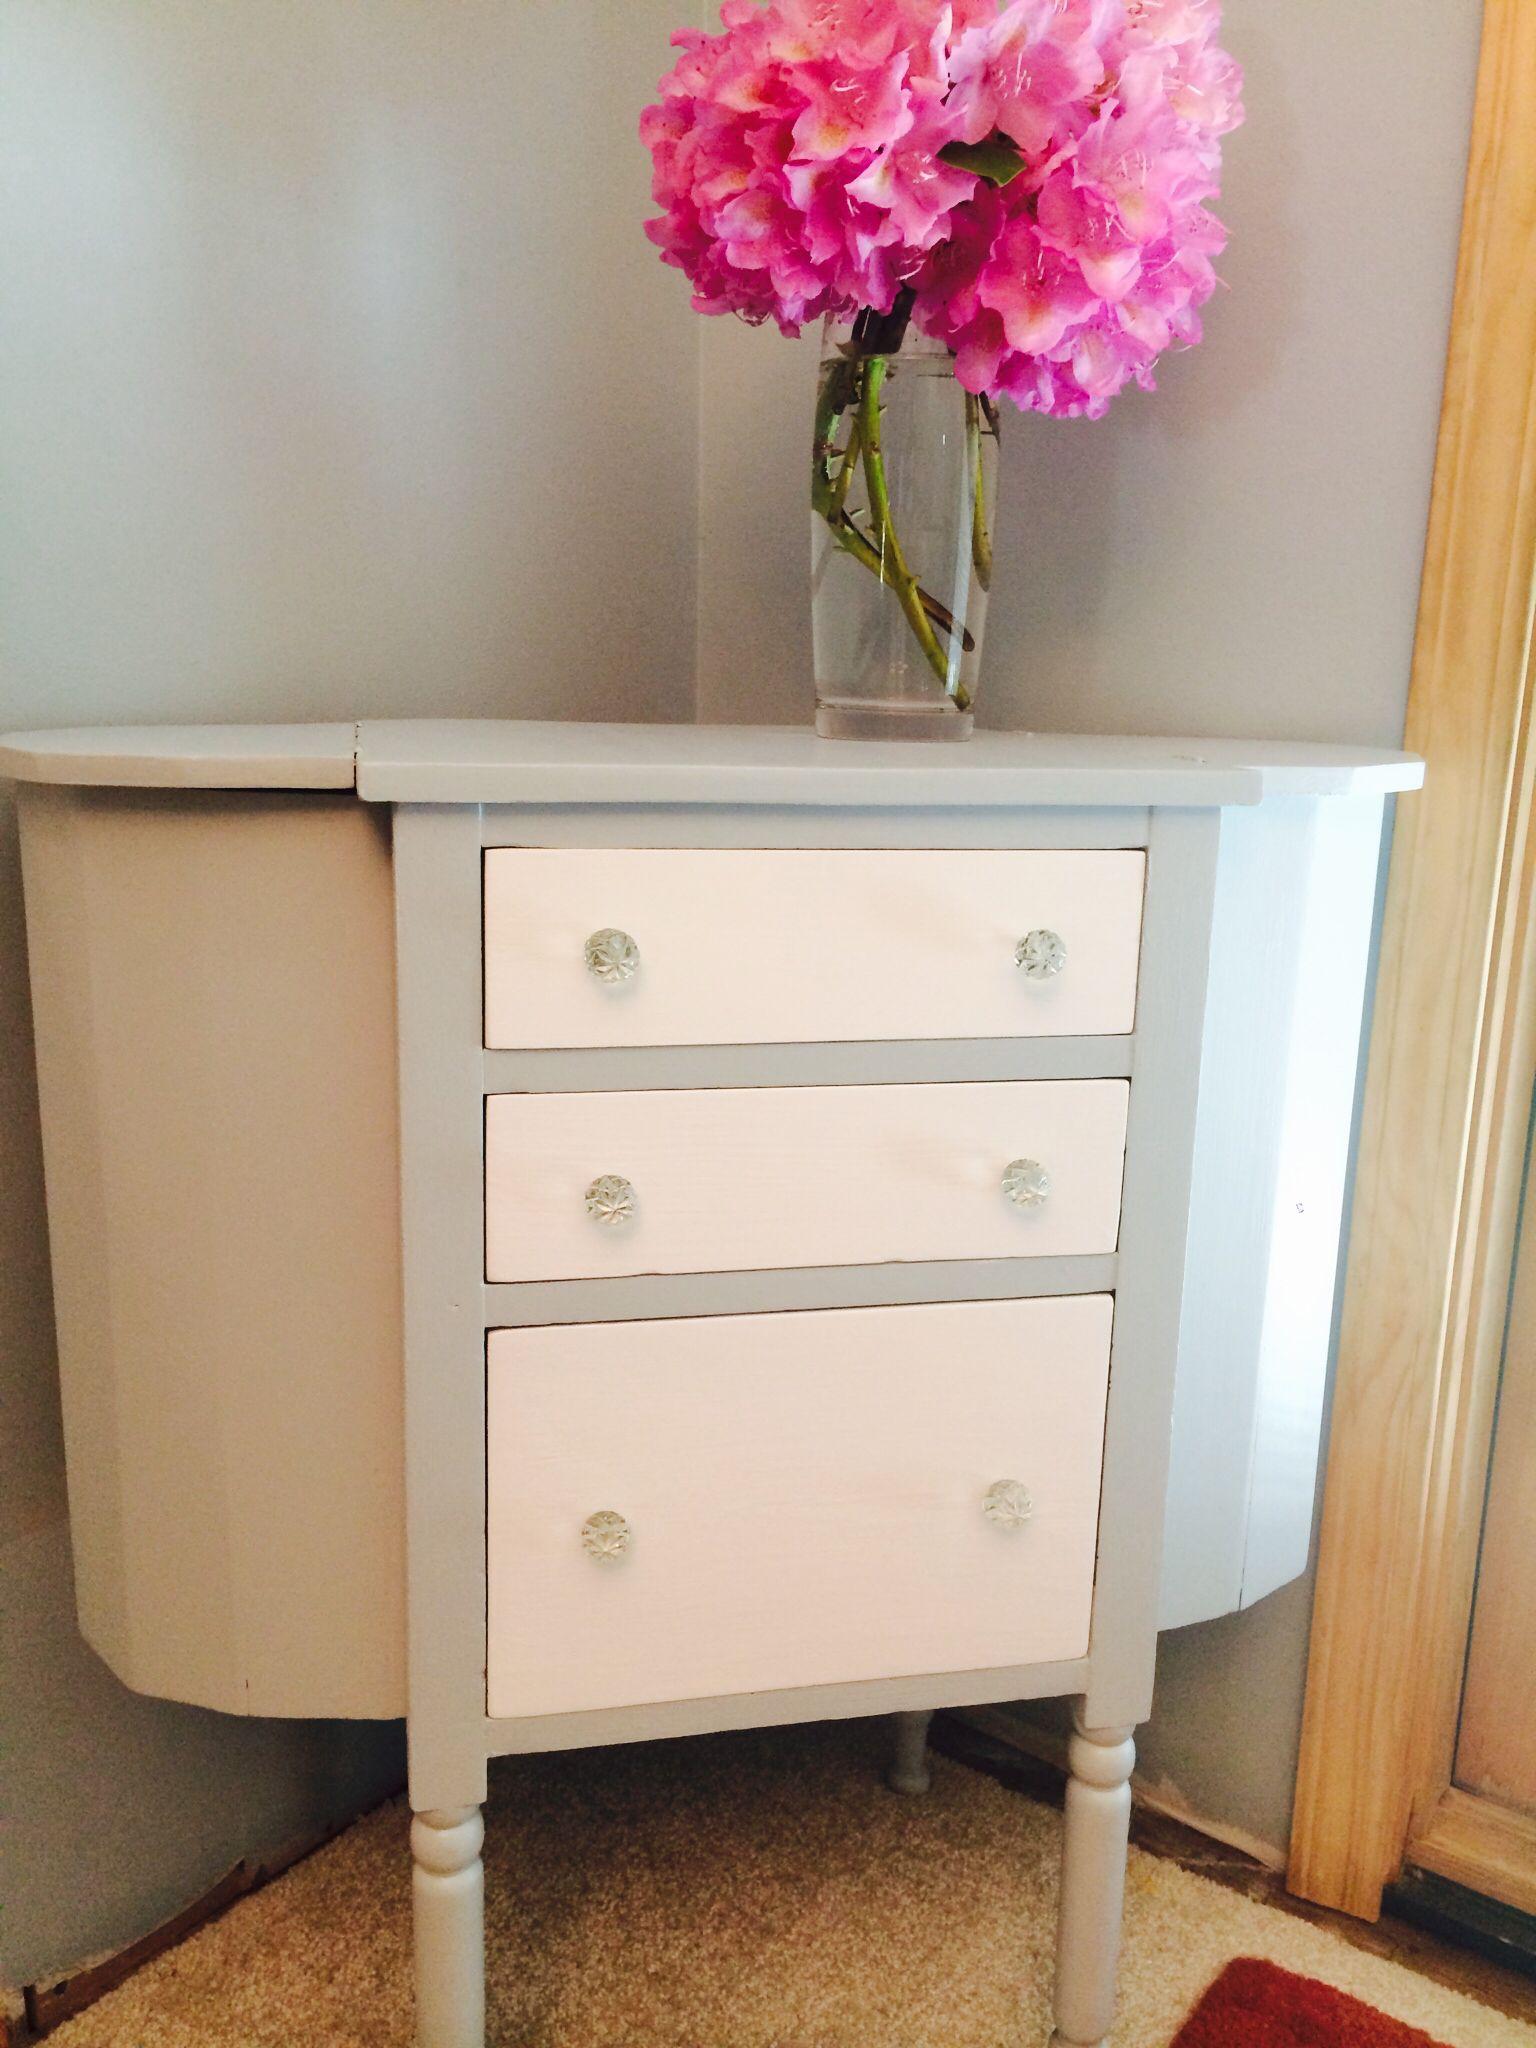 diy furniture refinishing projects. Washington Sewing Table, Refinished. Diy Furniture Refinishing Projects